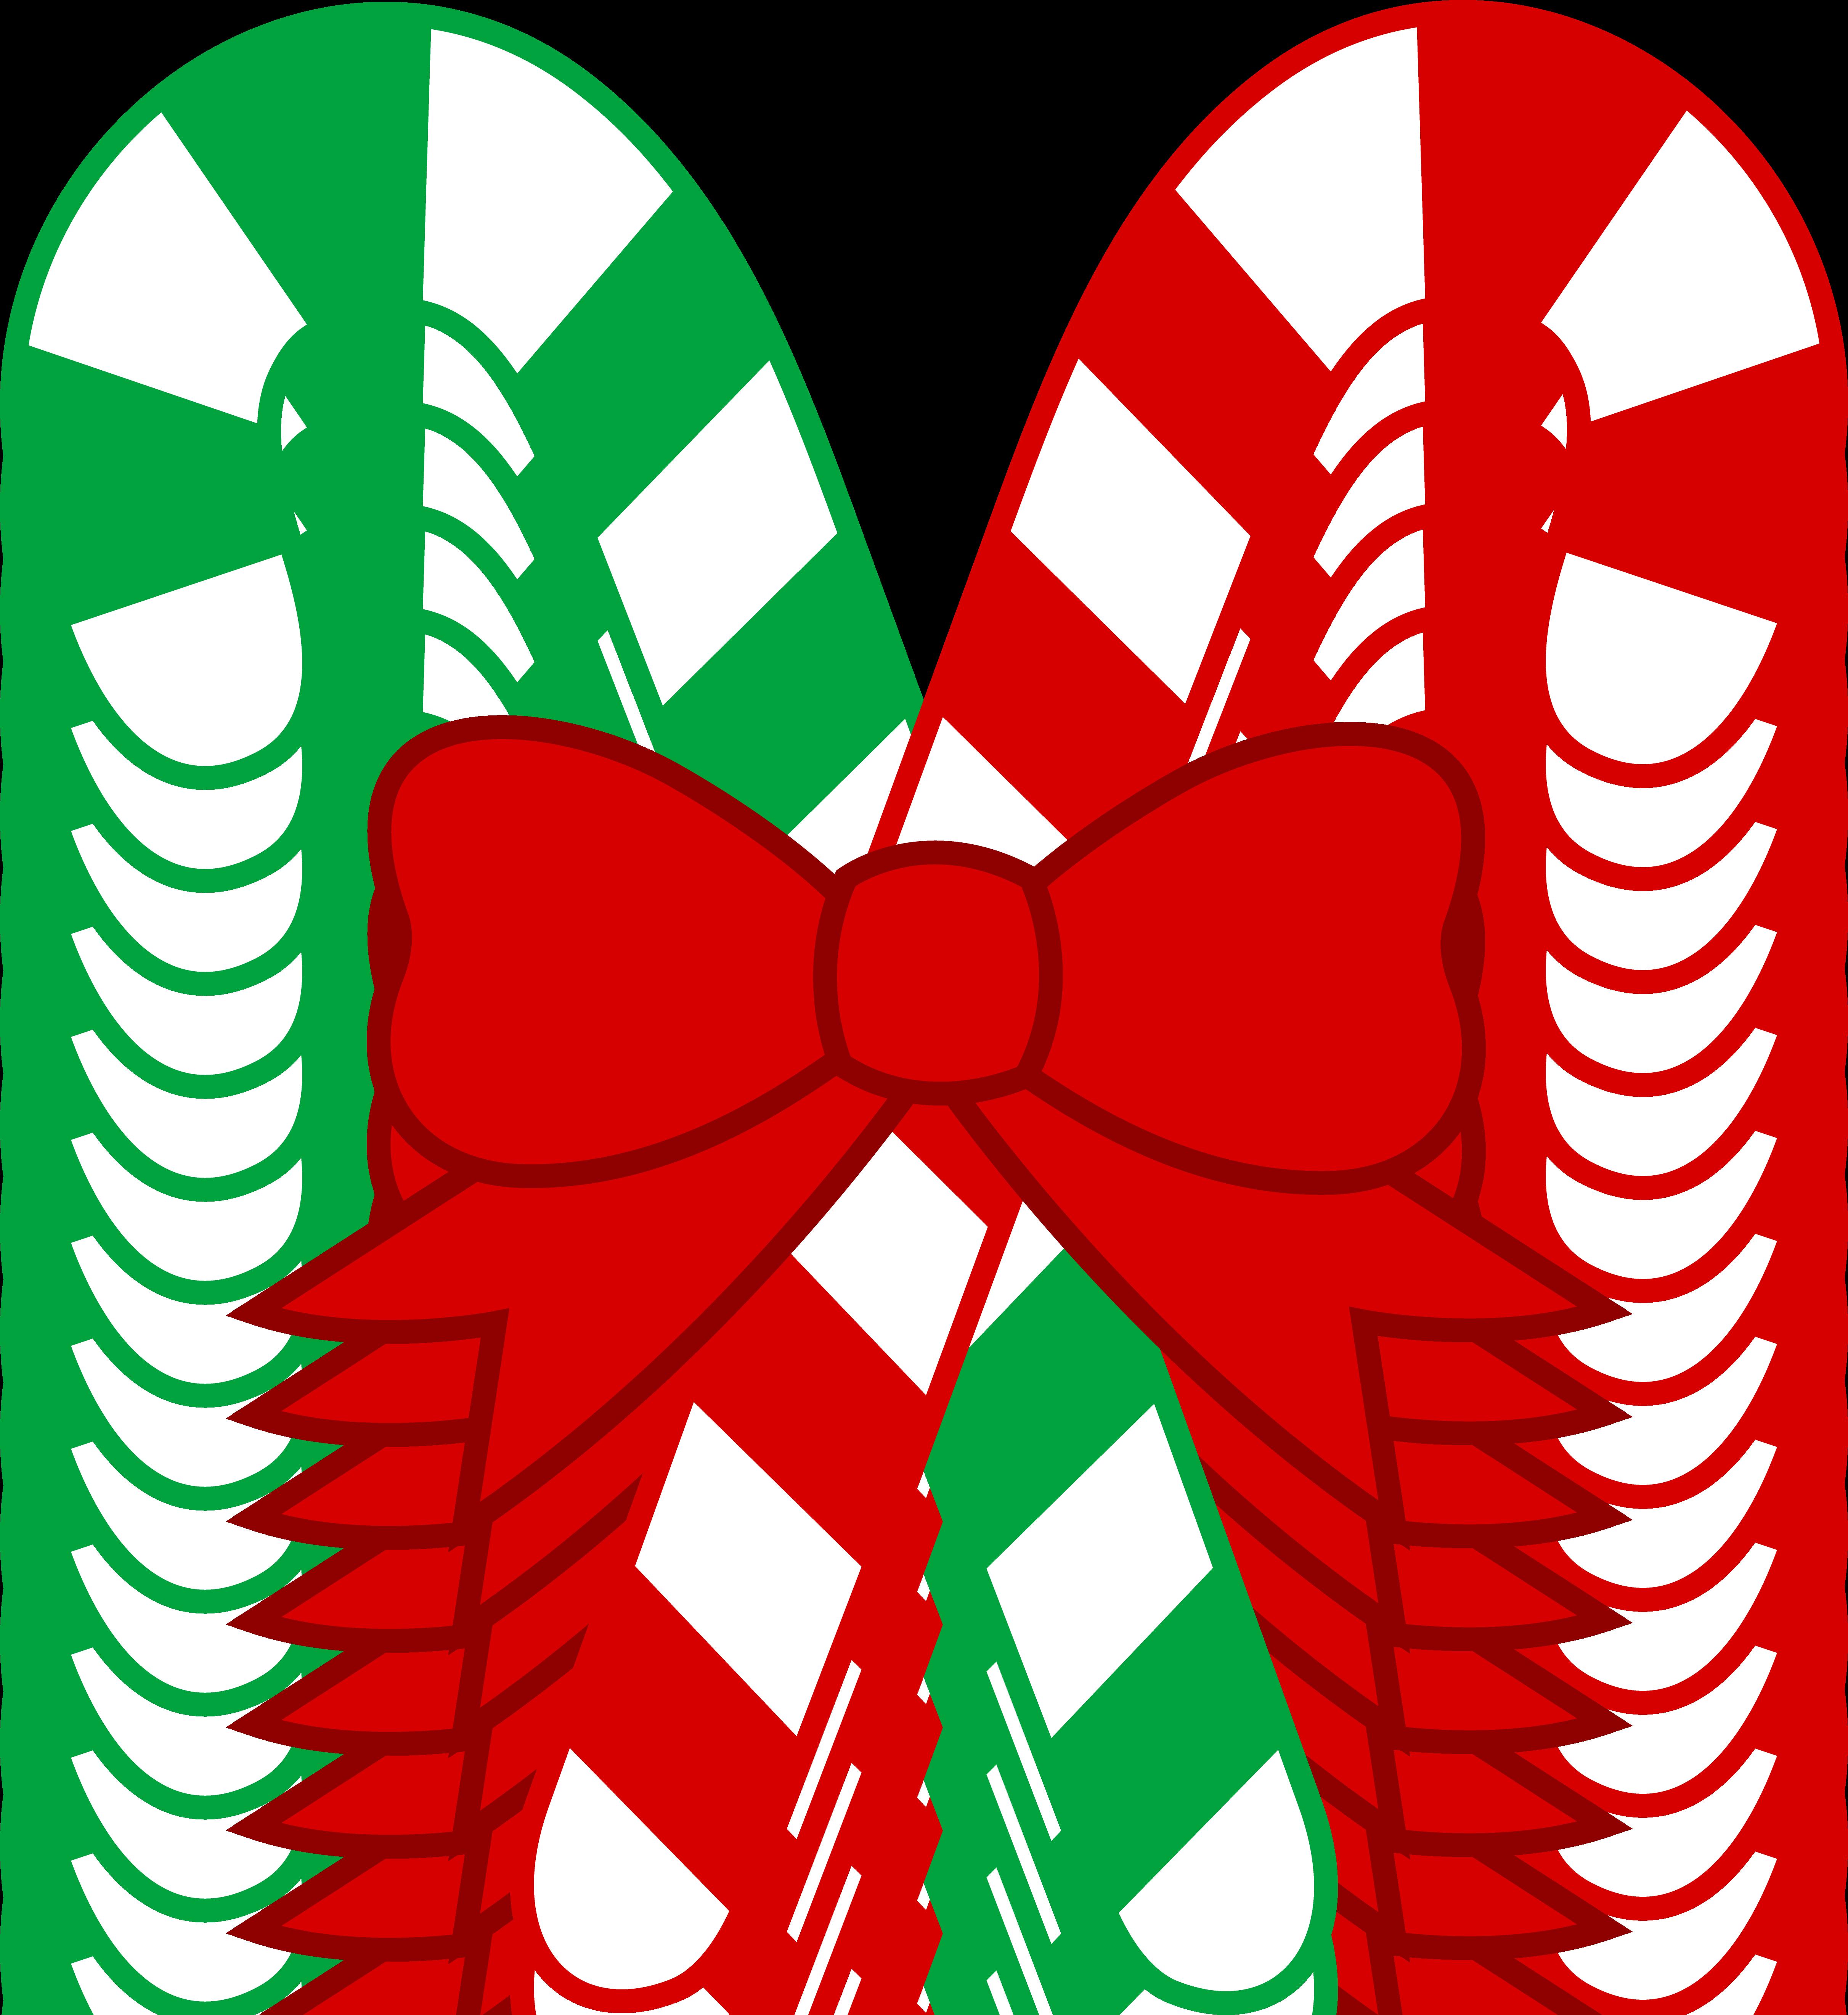 Christmas Pictures Clip Art ..-Christmas Pictures Clip Art ..-3